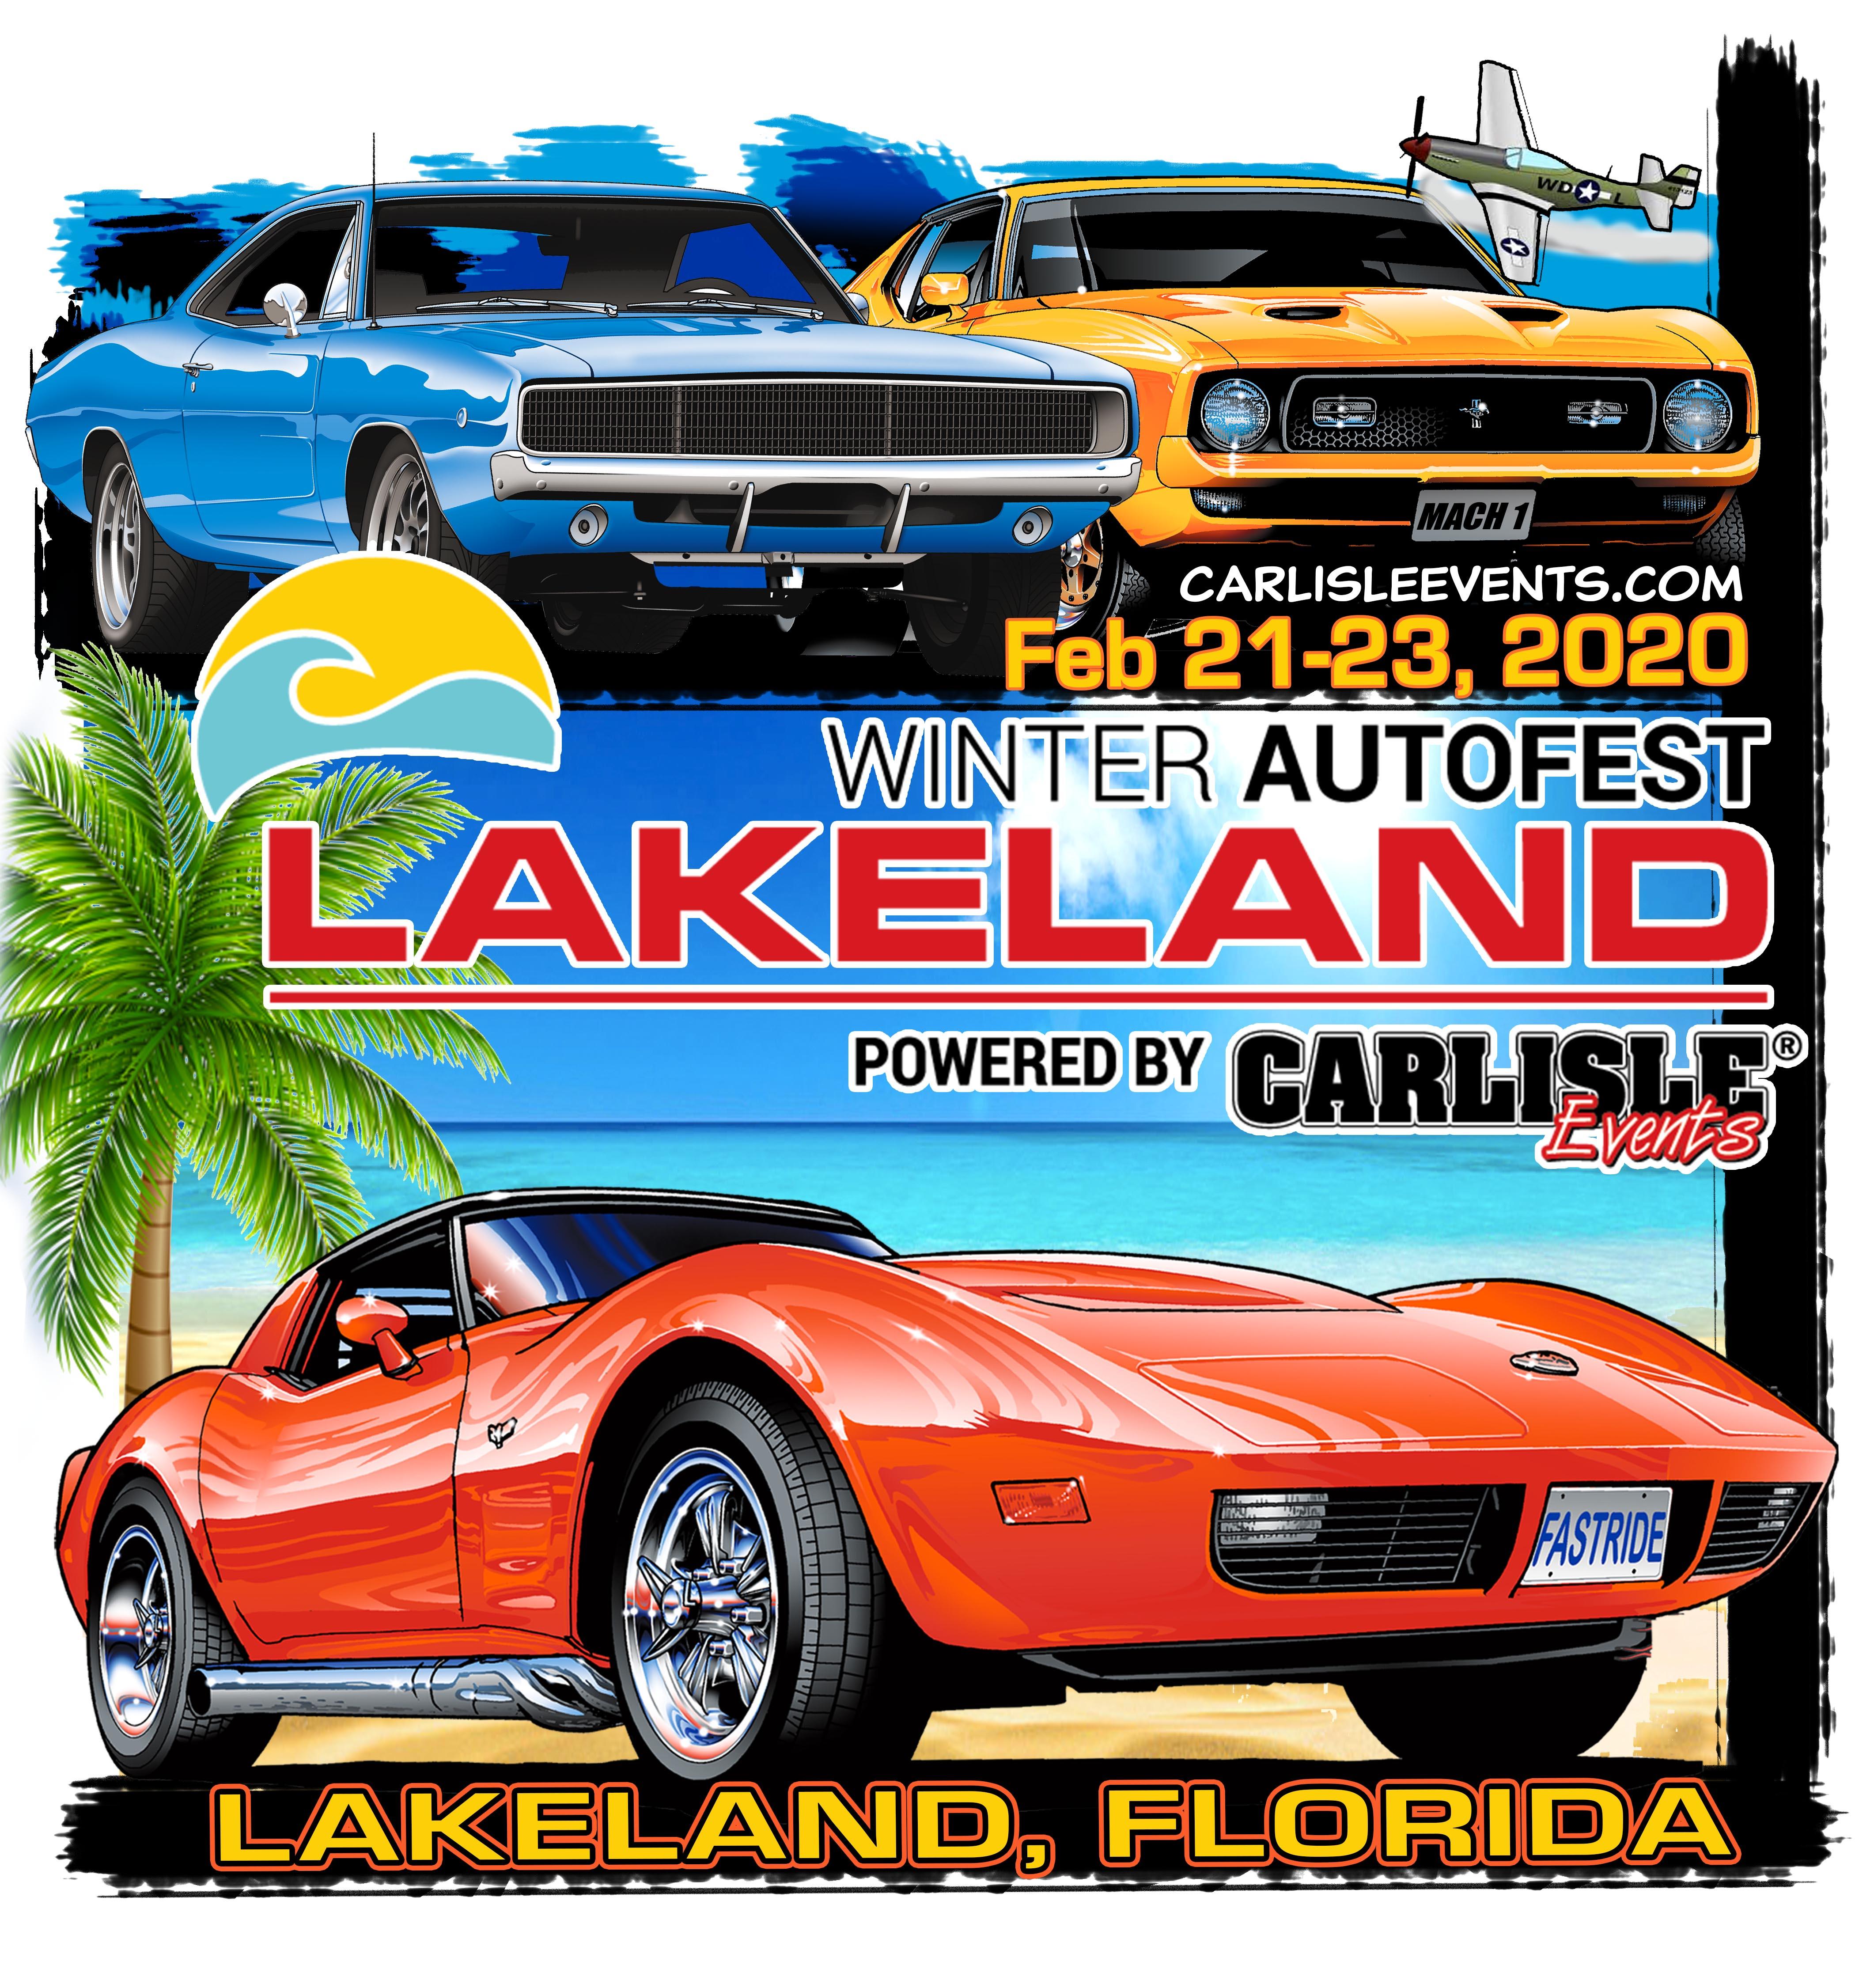 2020 Winter AutoFest Lakeland